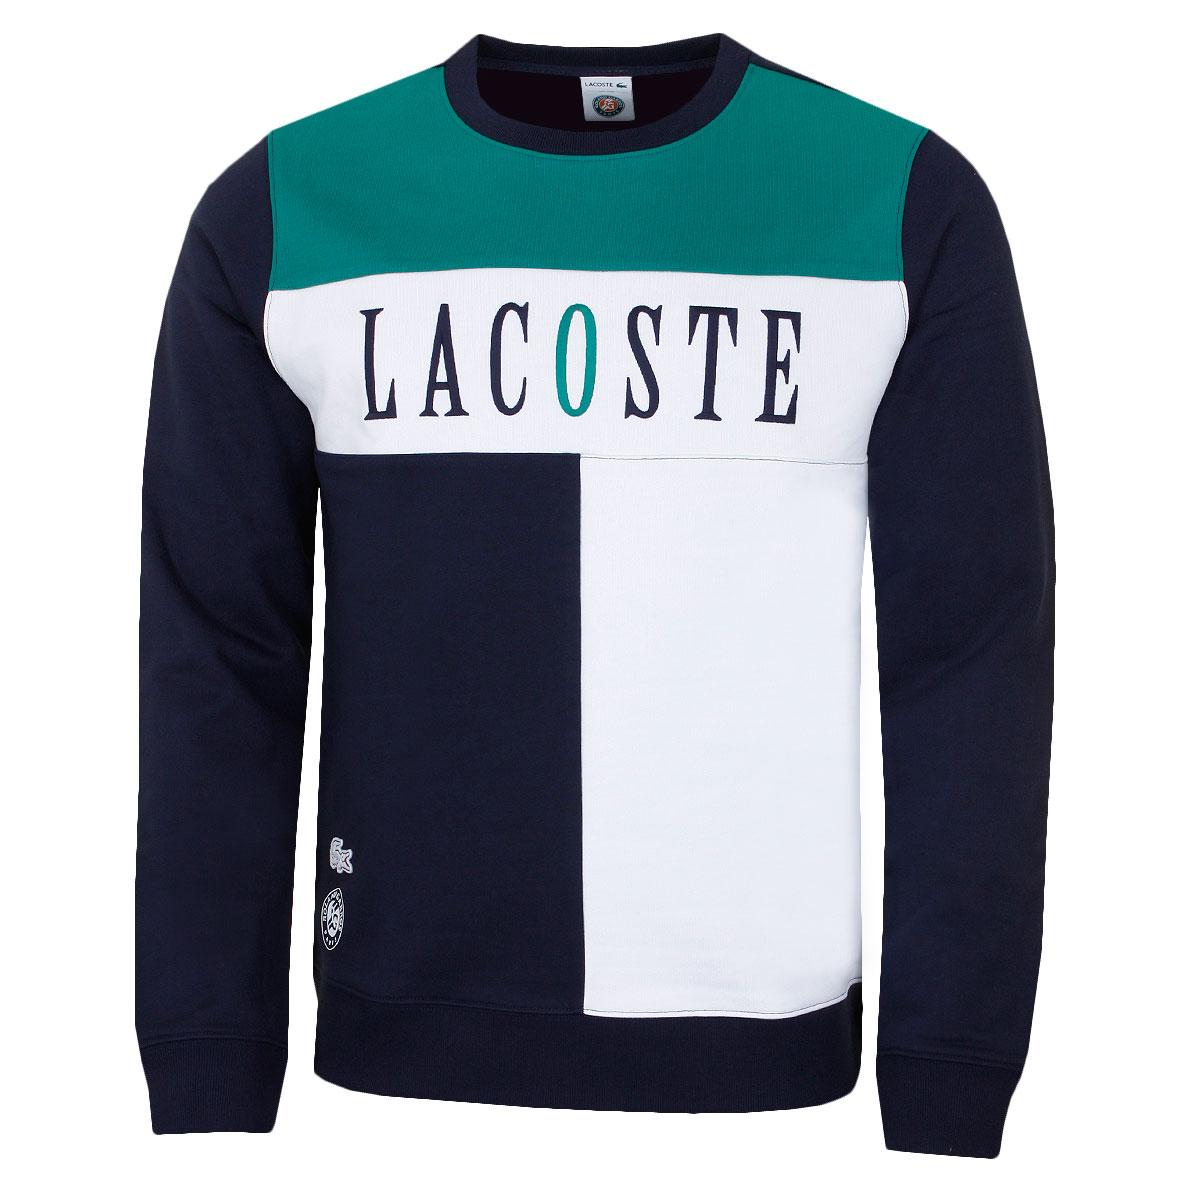 Details about Lacoste Mens 2019 Seasonal Roland Garros Crew Neck Tennis Sweater